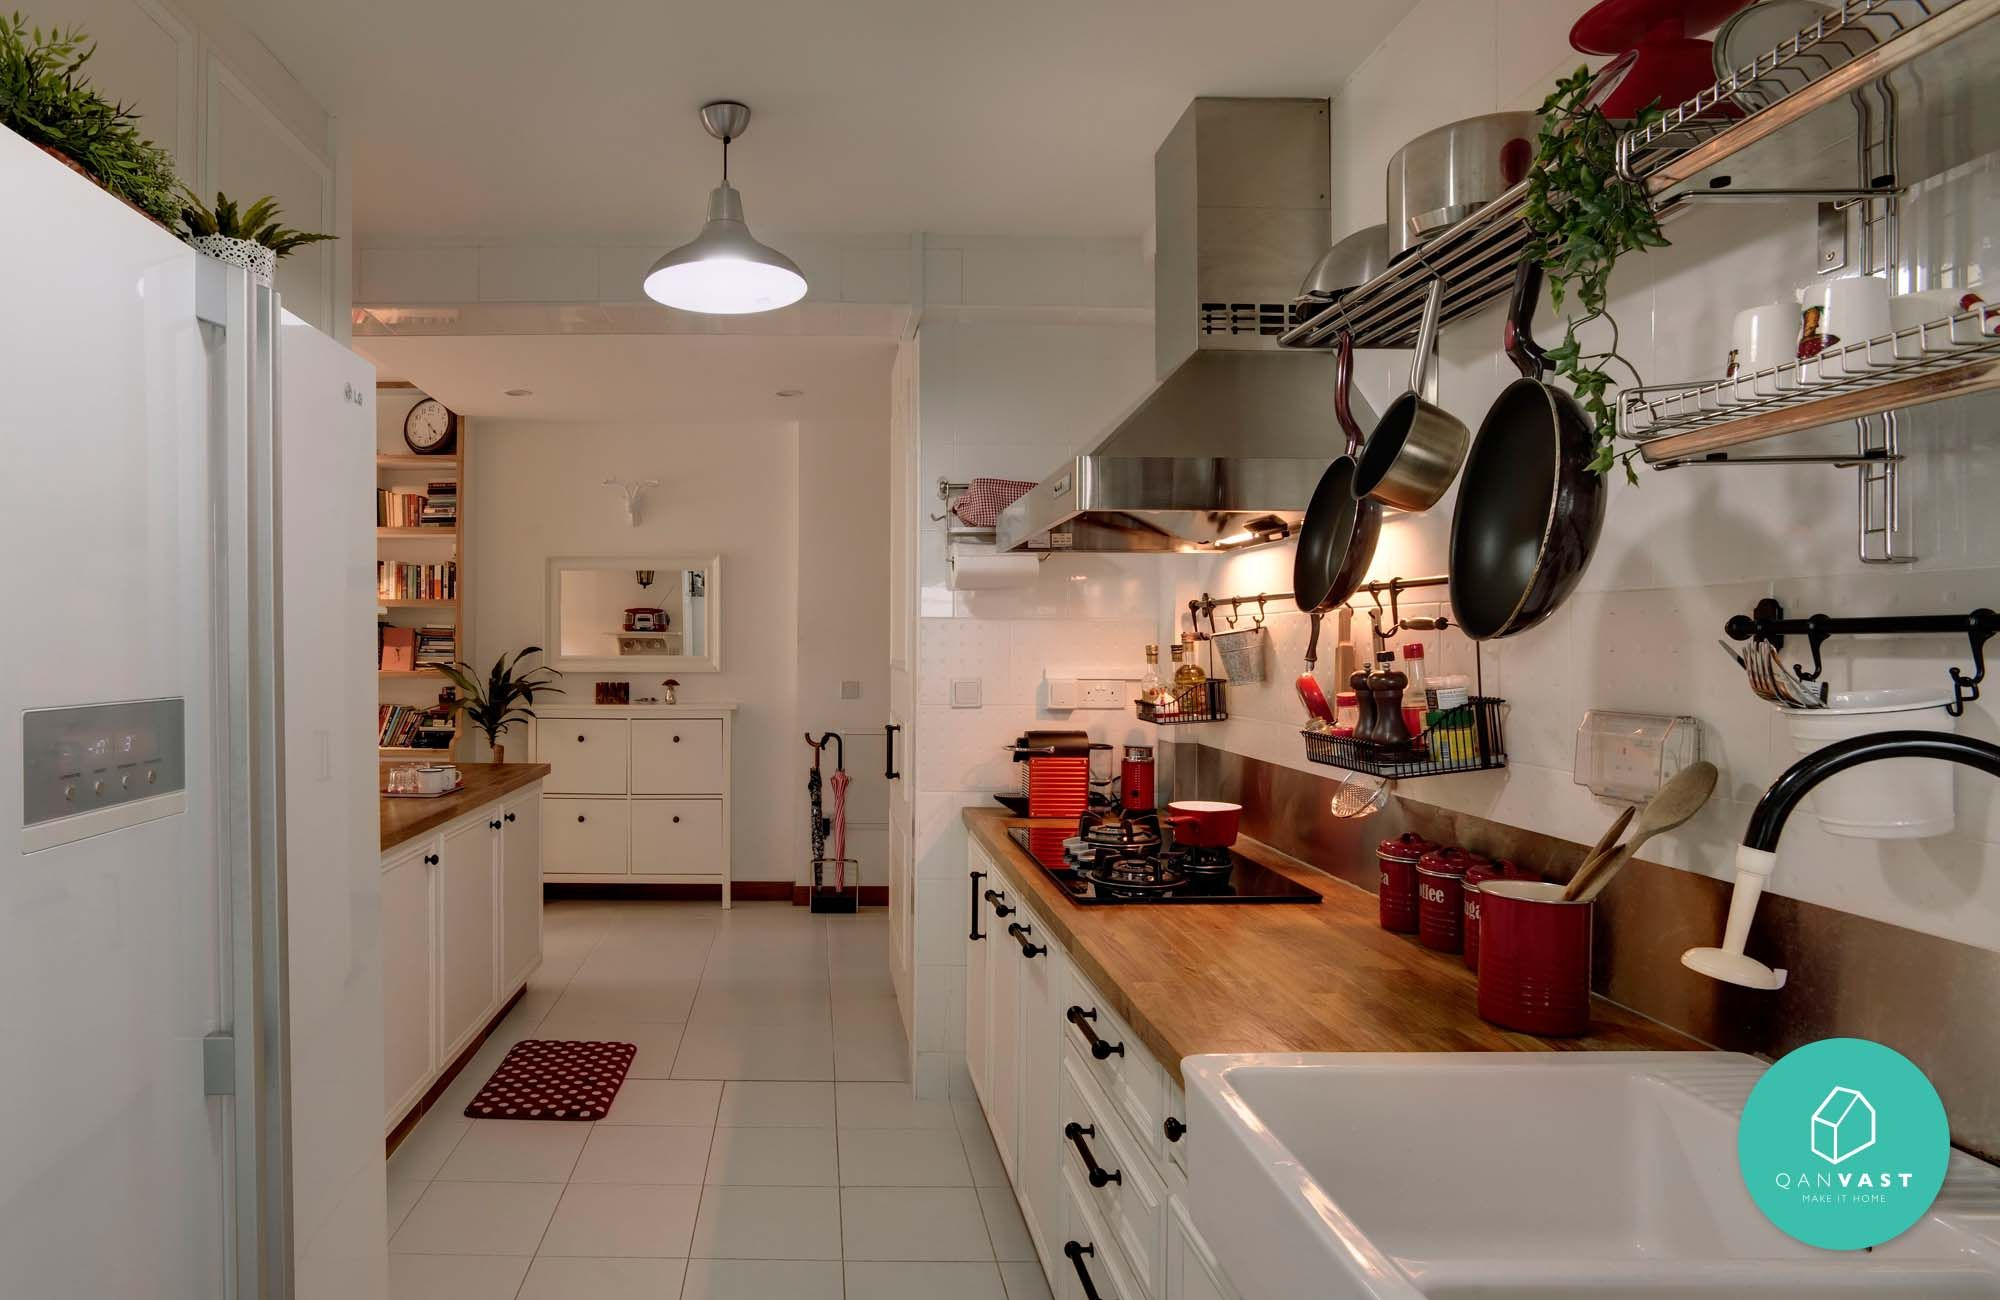 Punggol HDB kitchen (design practice.sg)